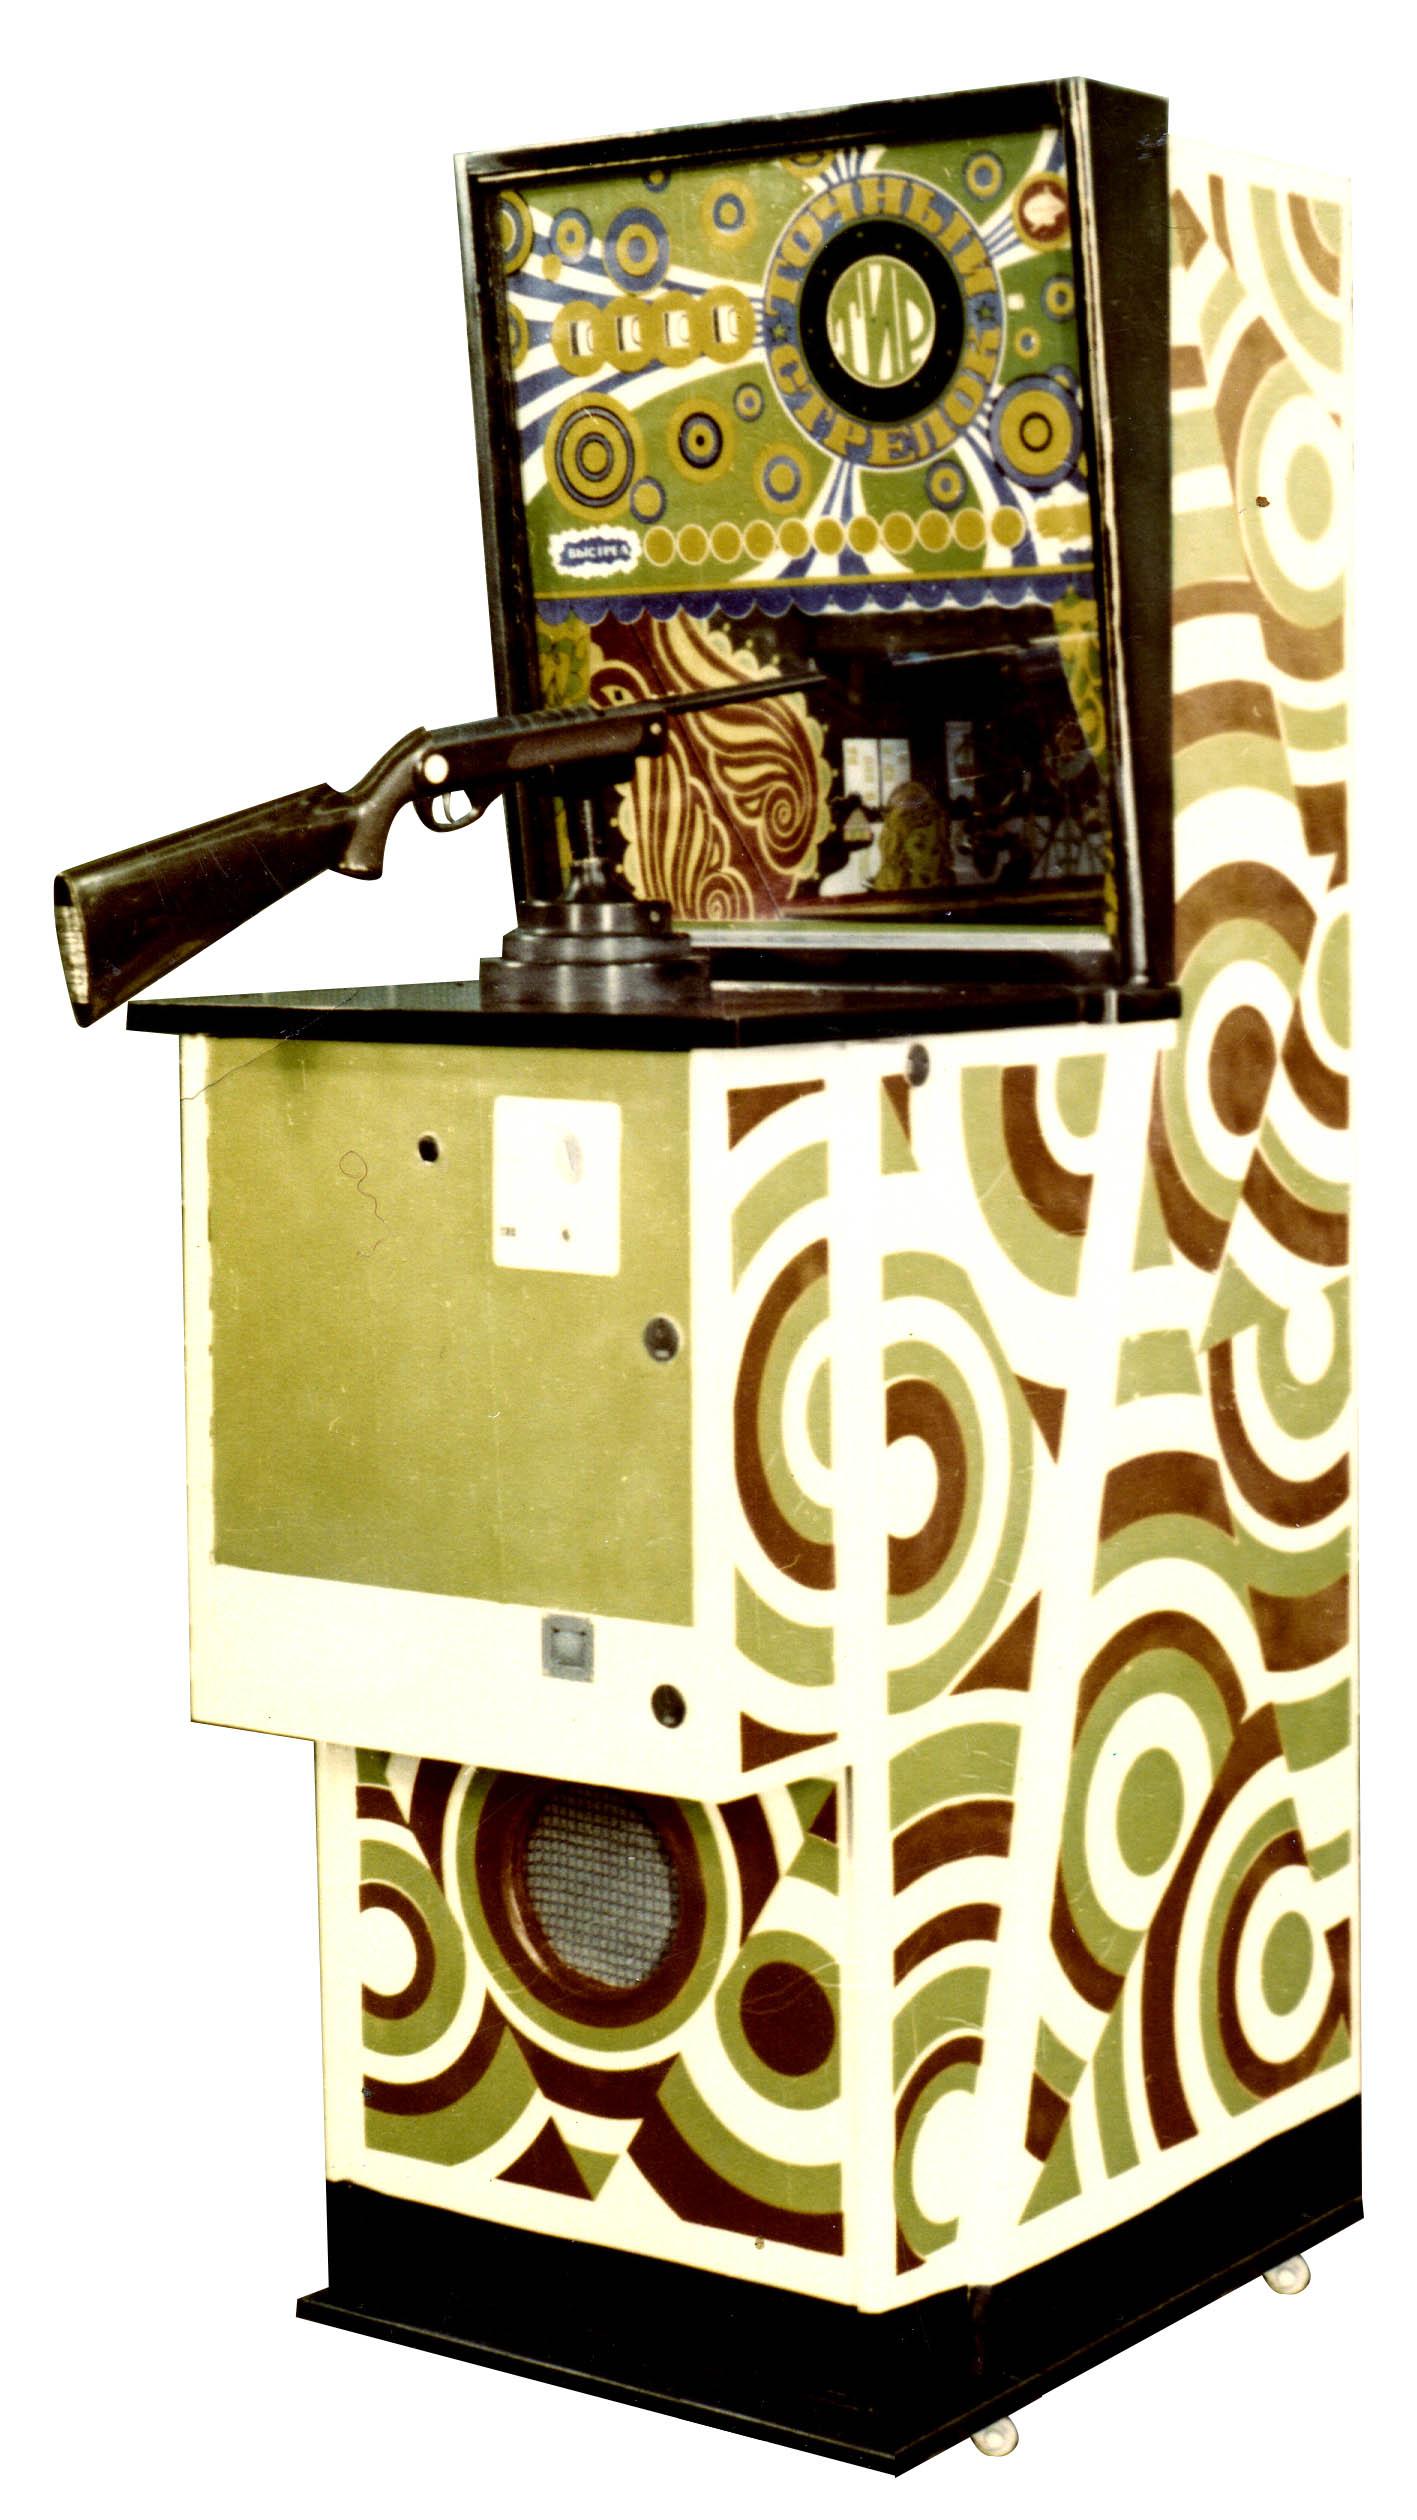 Big Bad Wolf Игровой Автомат Онлайн казино PlayFortuna